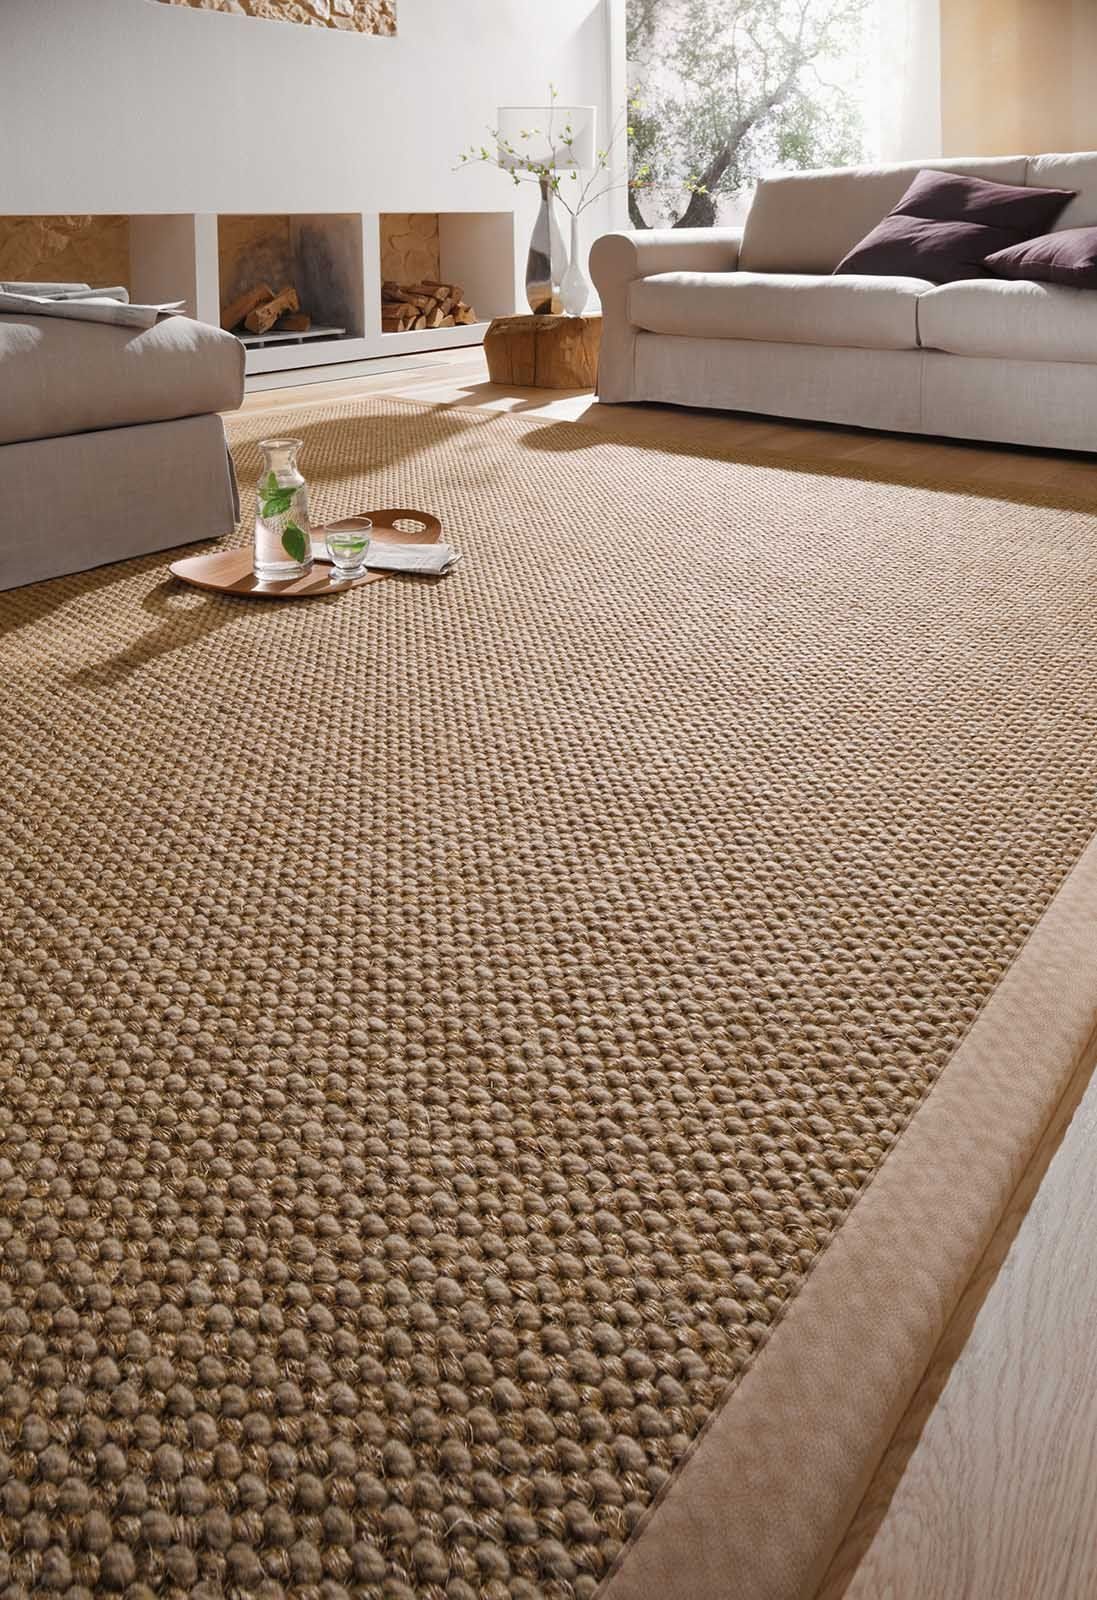 Lavare Tappeto Lana Ikea tappeti in fibre naturali | tappeti naturali, tappeti, idee